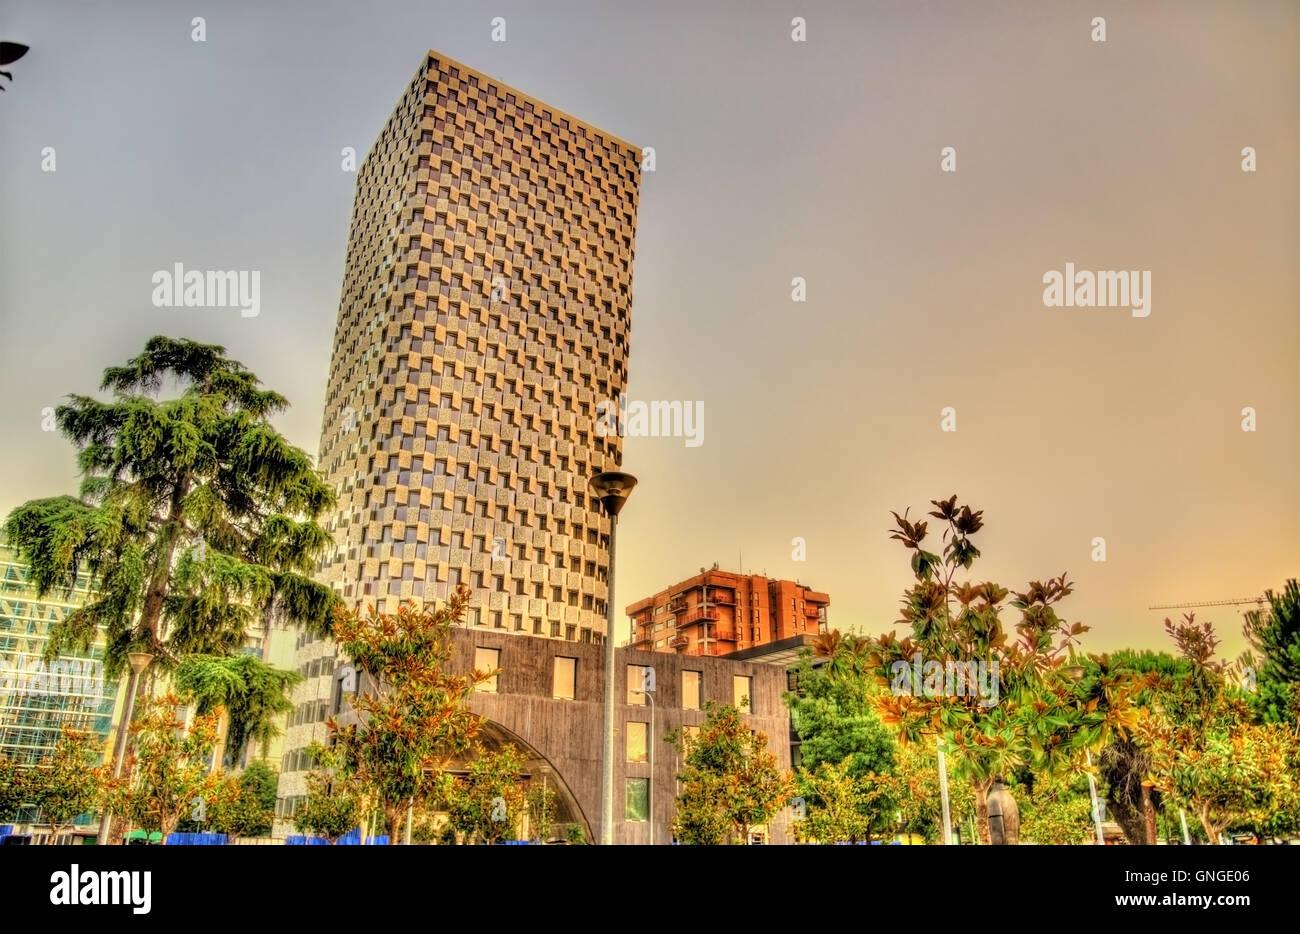 Buildings in the city centre of Tirana - Albania - Stock Image